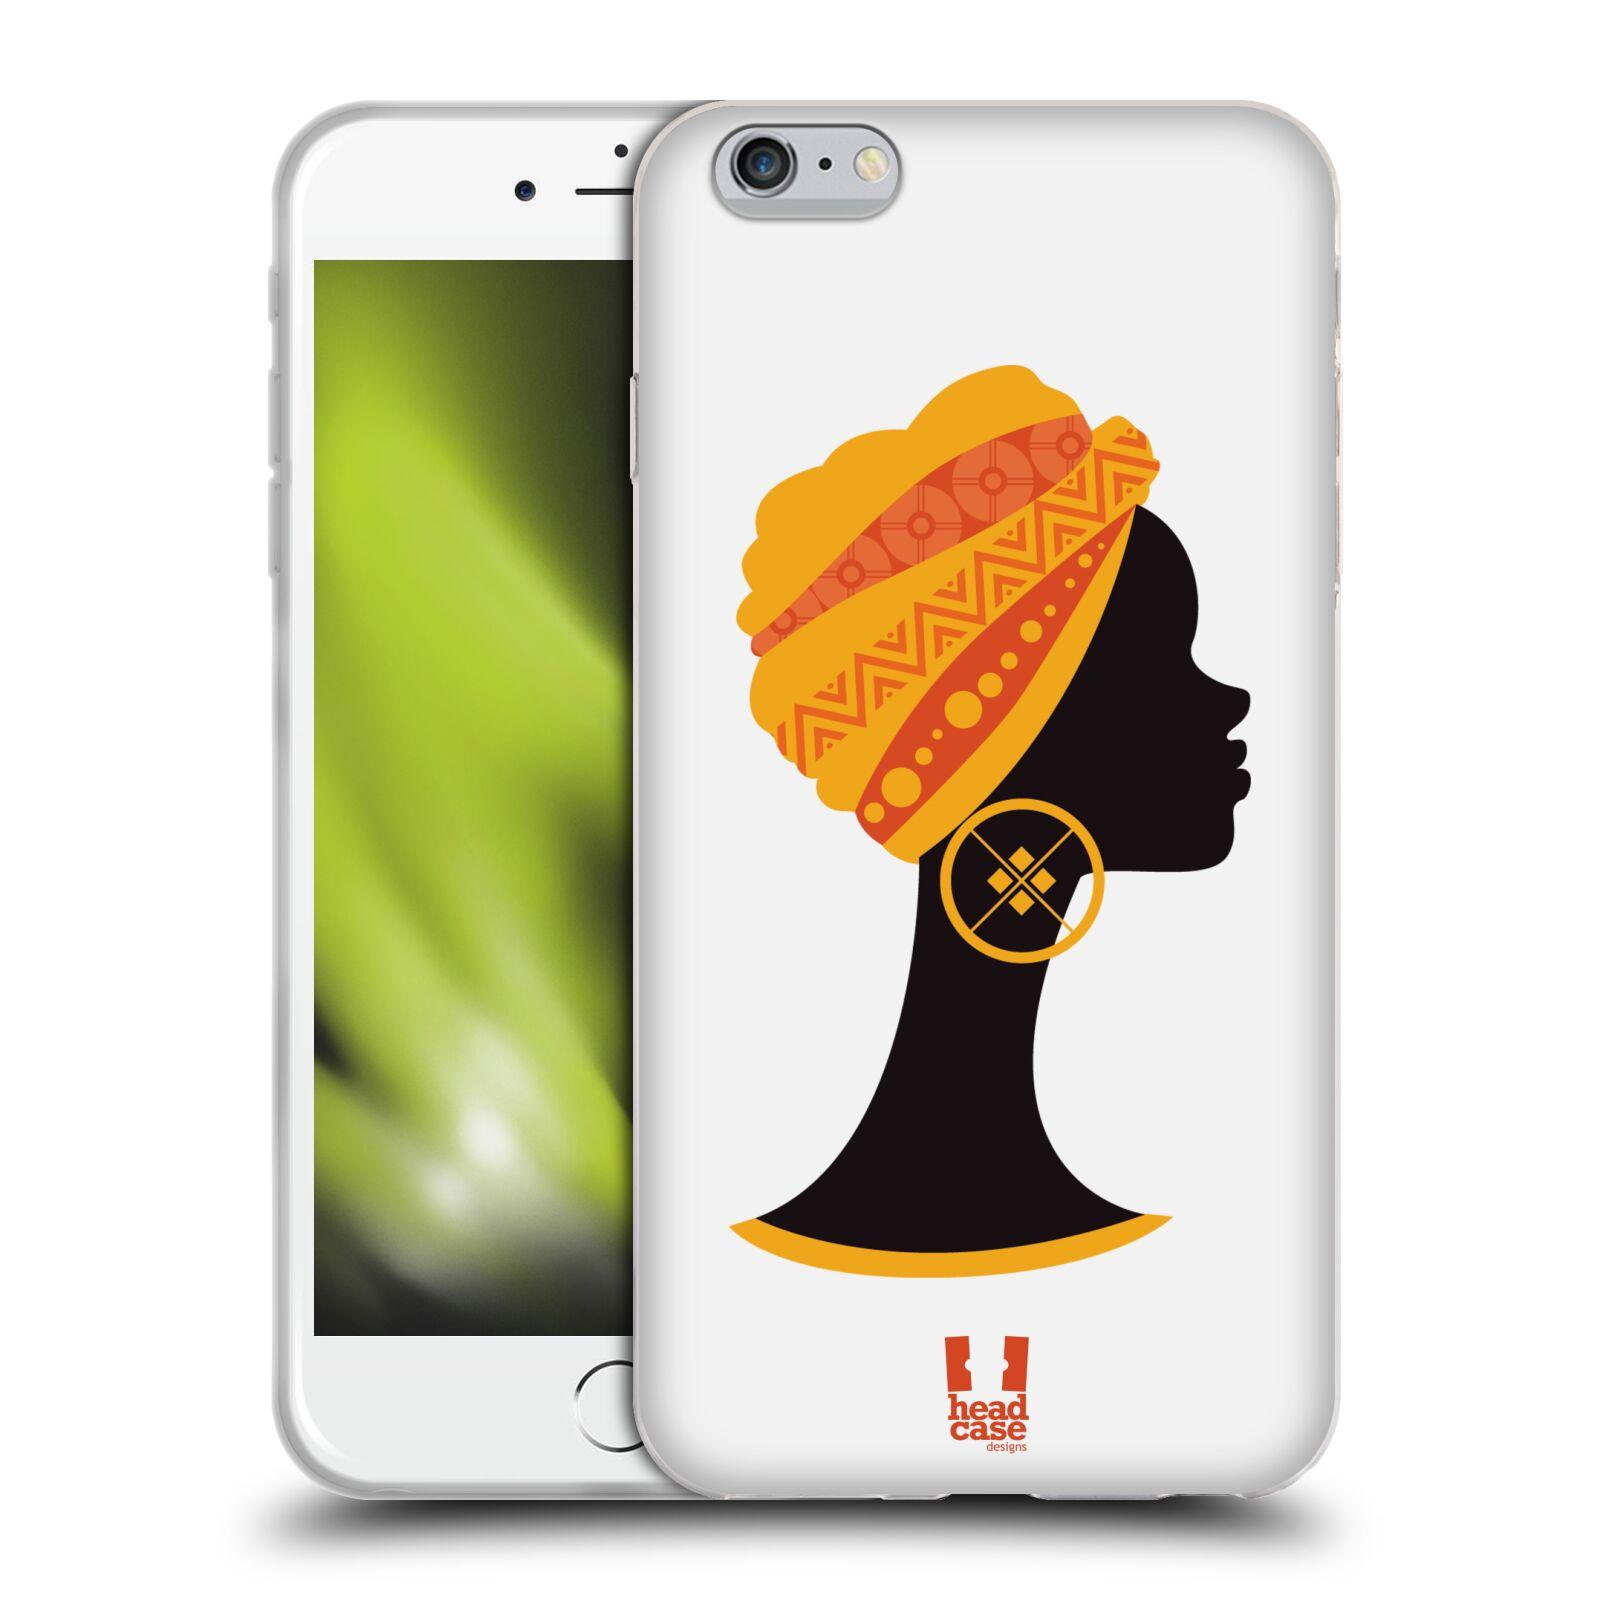 HEAD CASE silikonový obal na mobil Apple Iphone 6 PLUS/ 6S PLUS vzor Africké motivy SILUETA